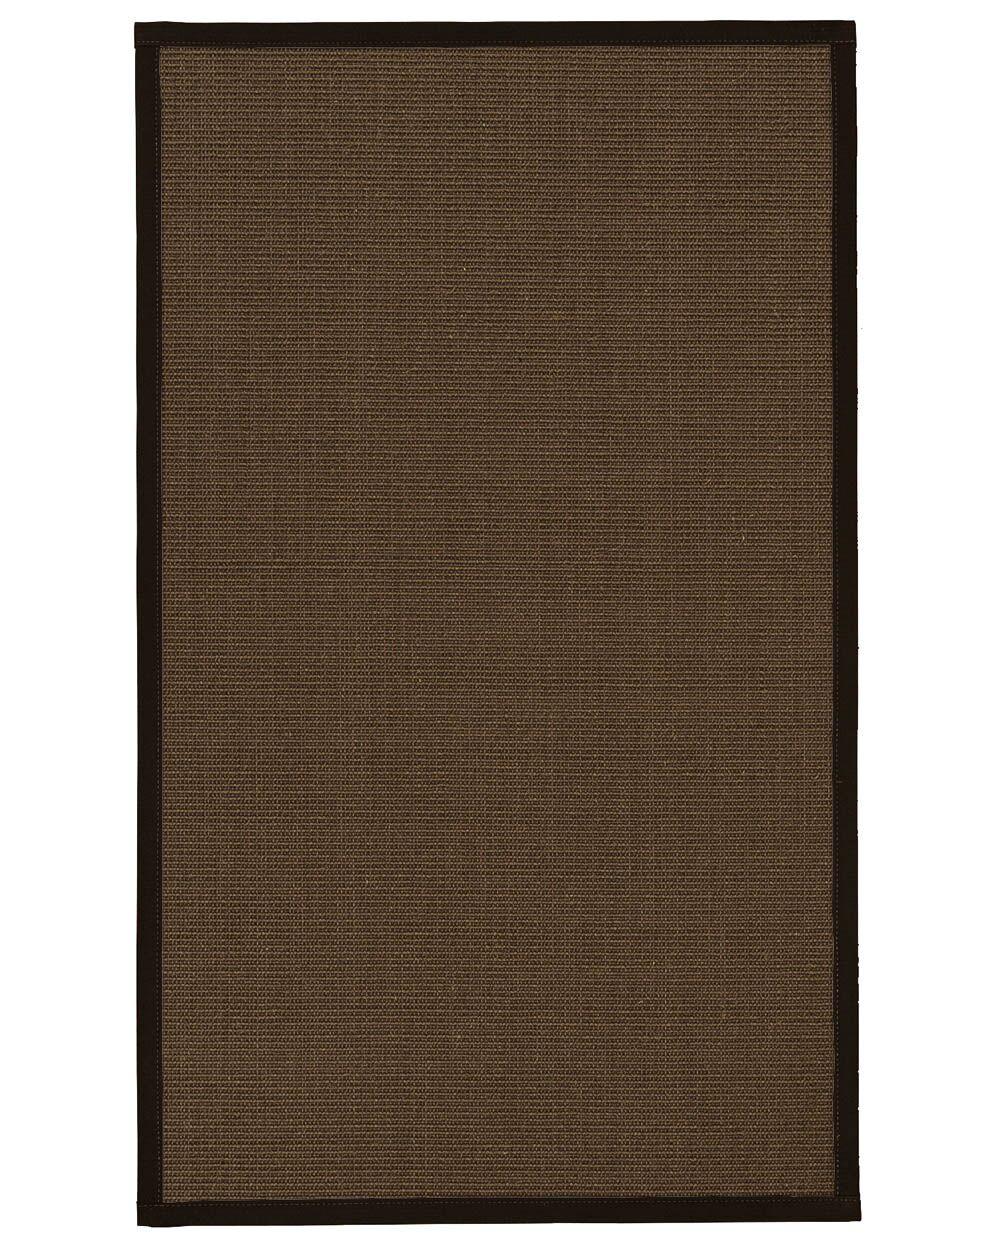 Beck Natural Fiber Sisal Plus Bonus Hand-Woven Beige Area Rug Rug Size: Rectangle 5' x 8'